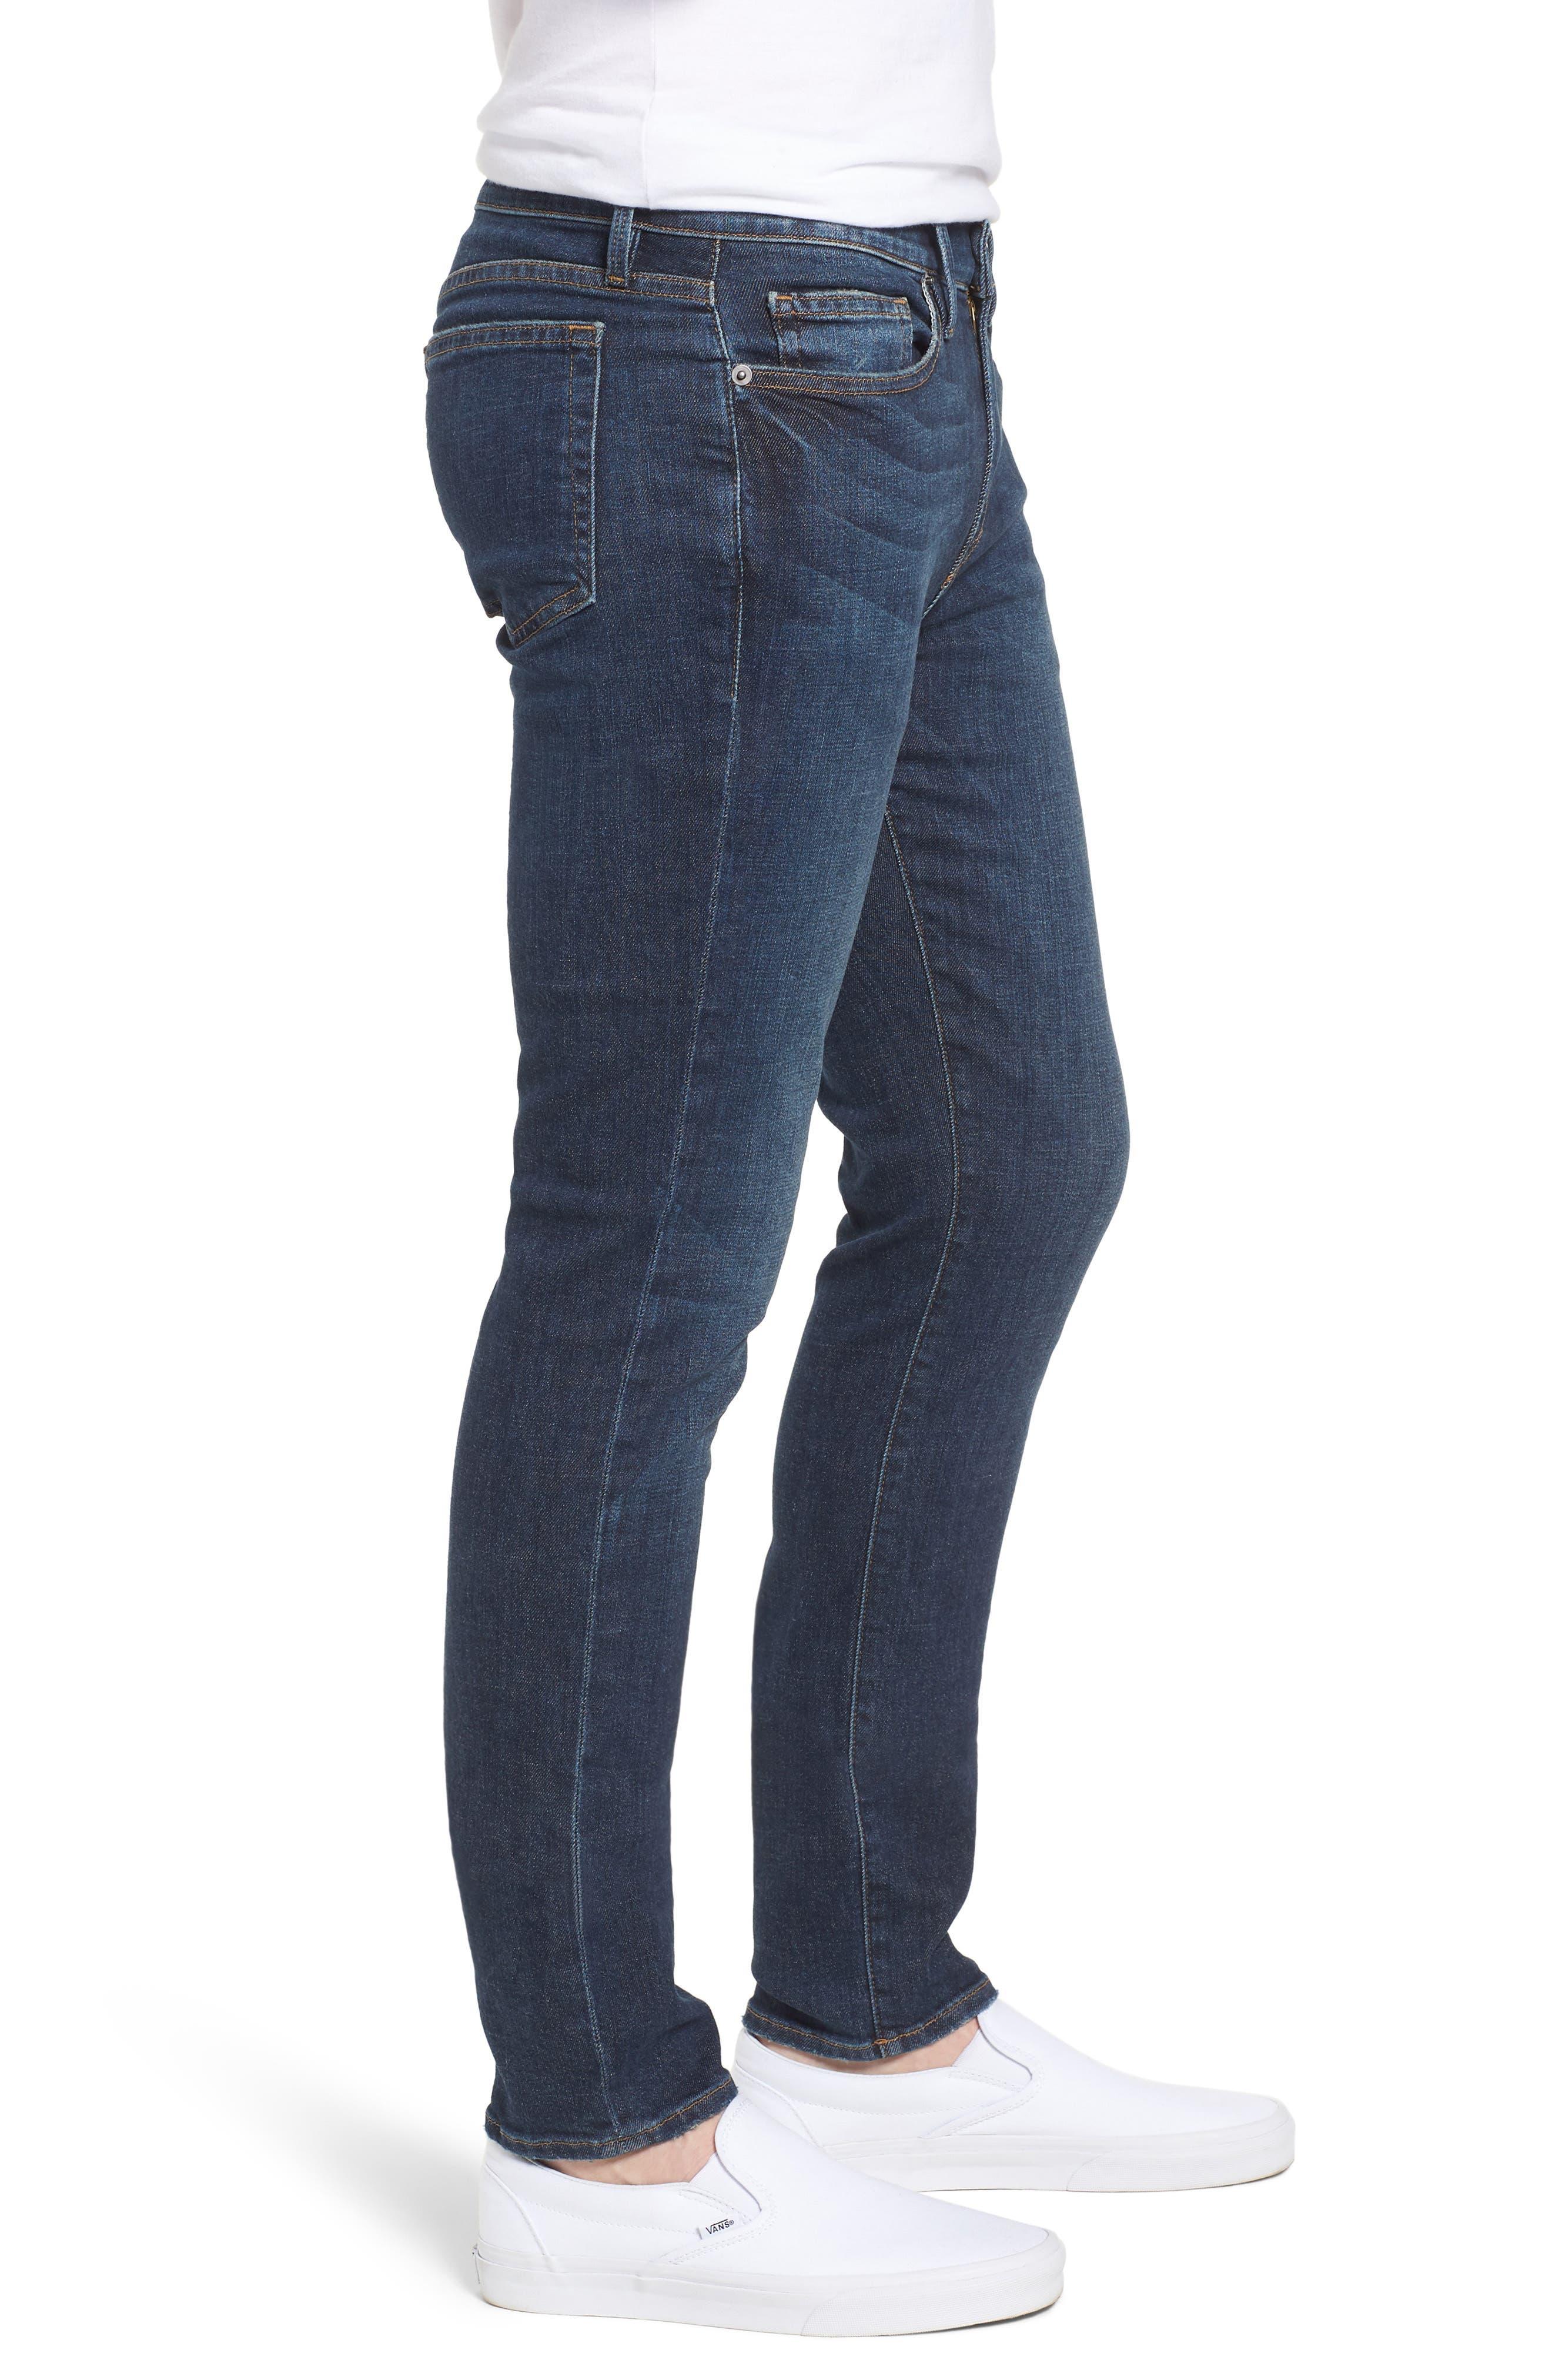 L'Homme Skinny Jeans,                             Alternate thumbnail 3, color,                             Loris